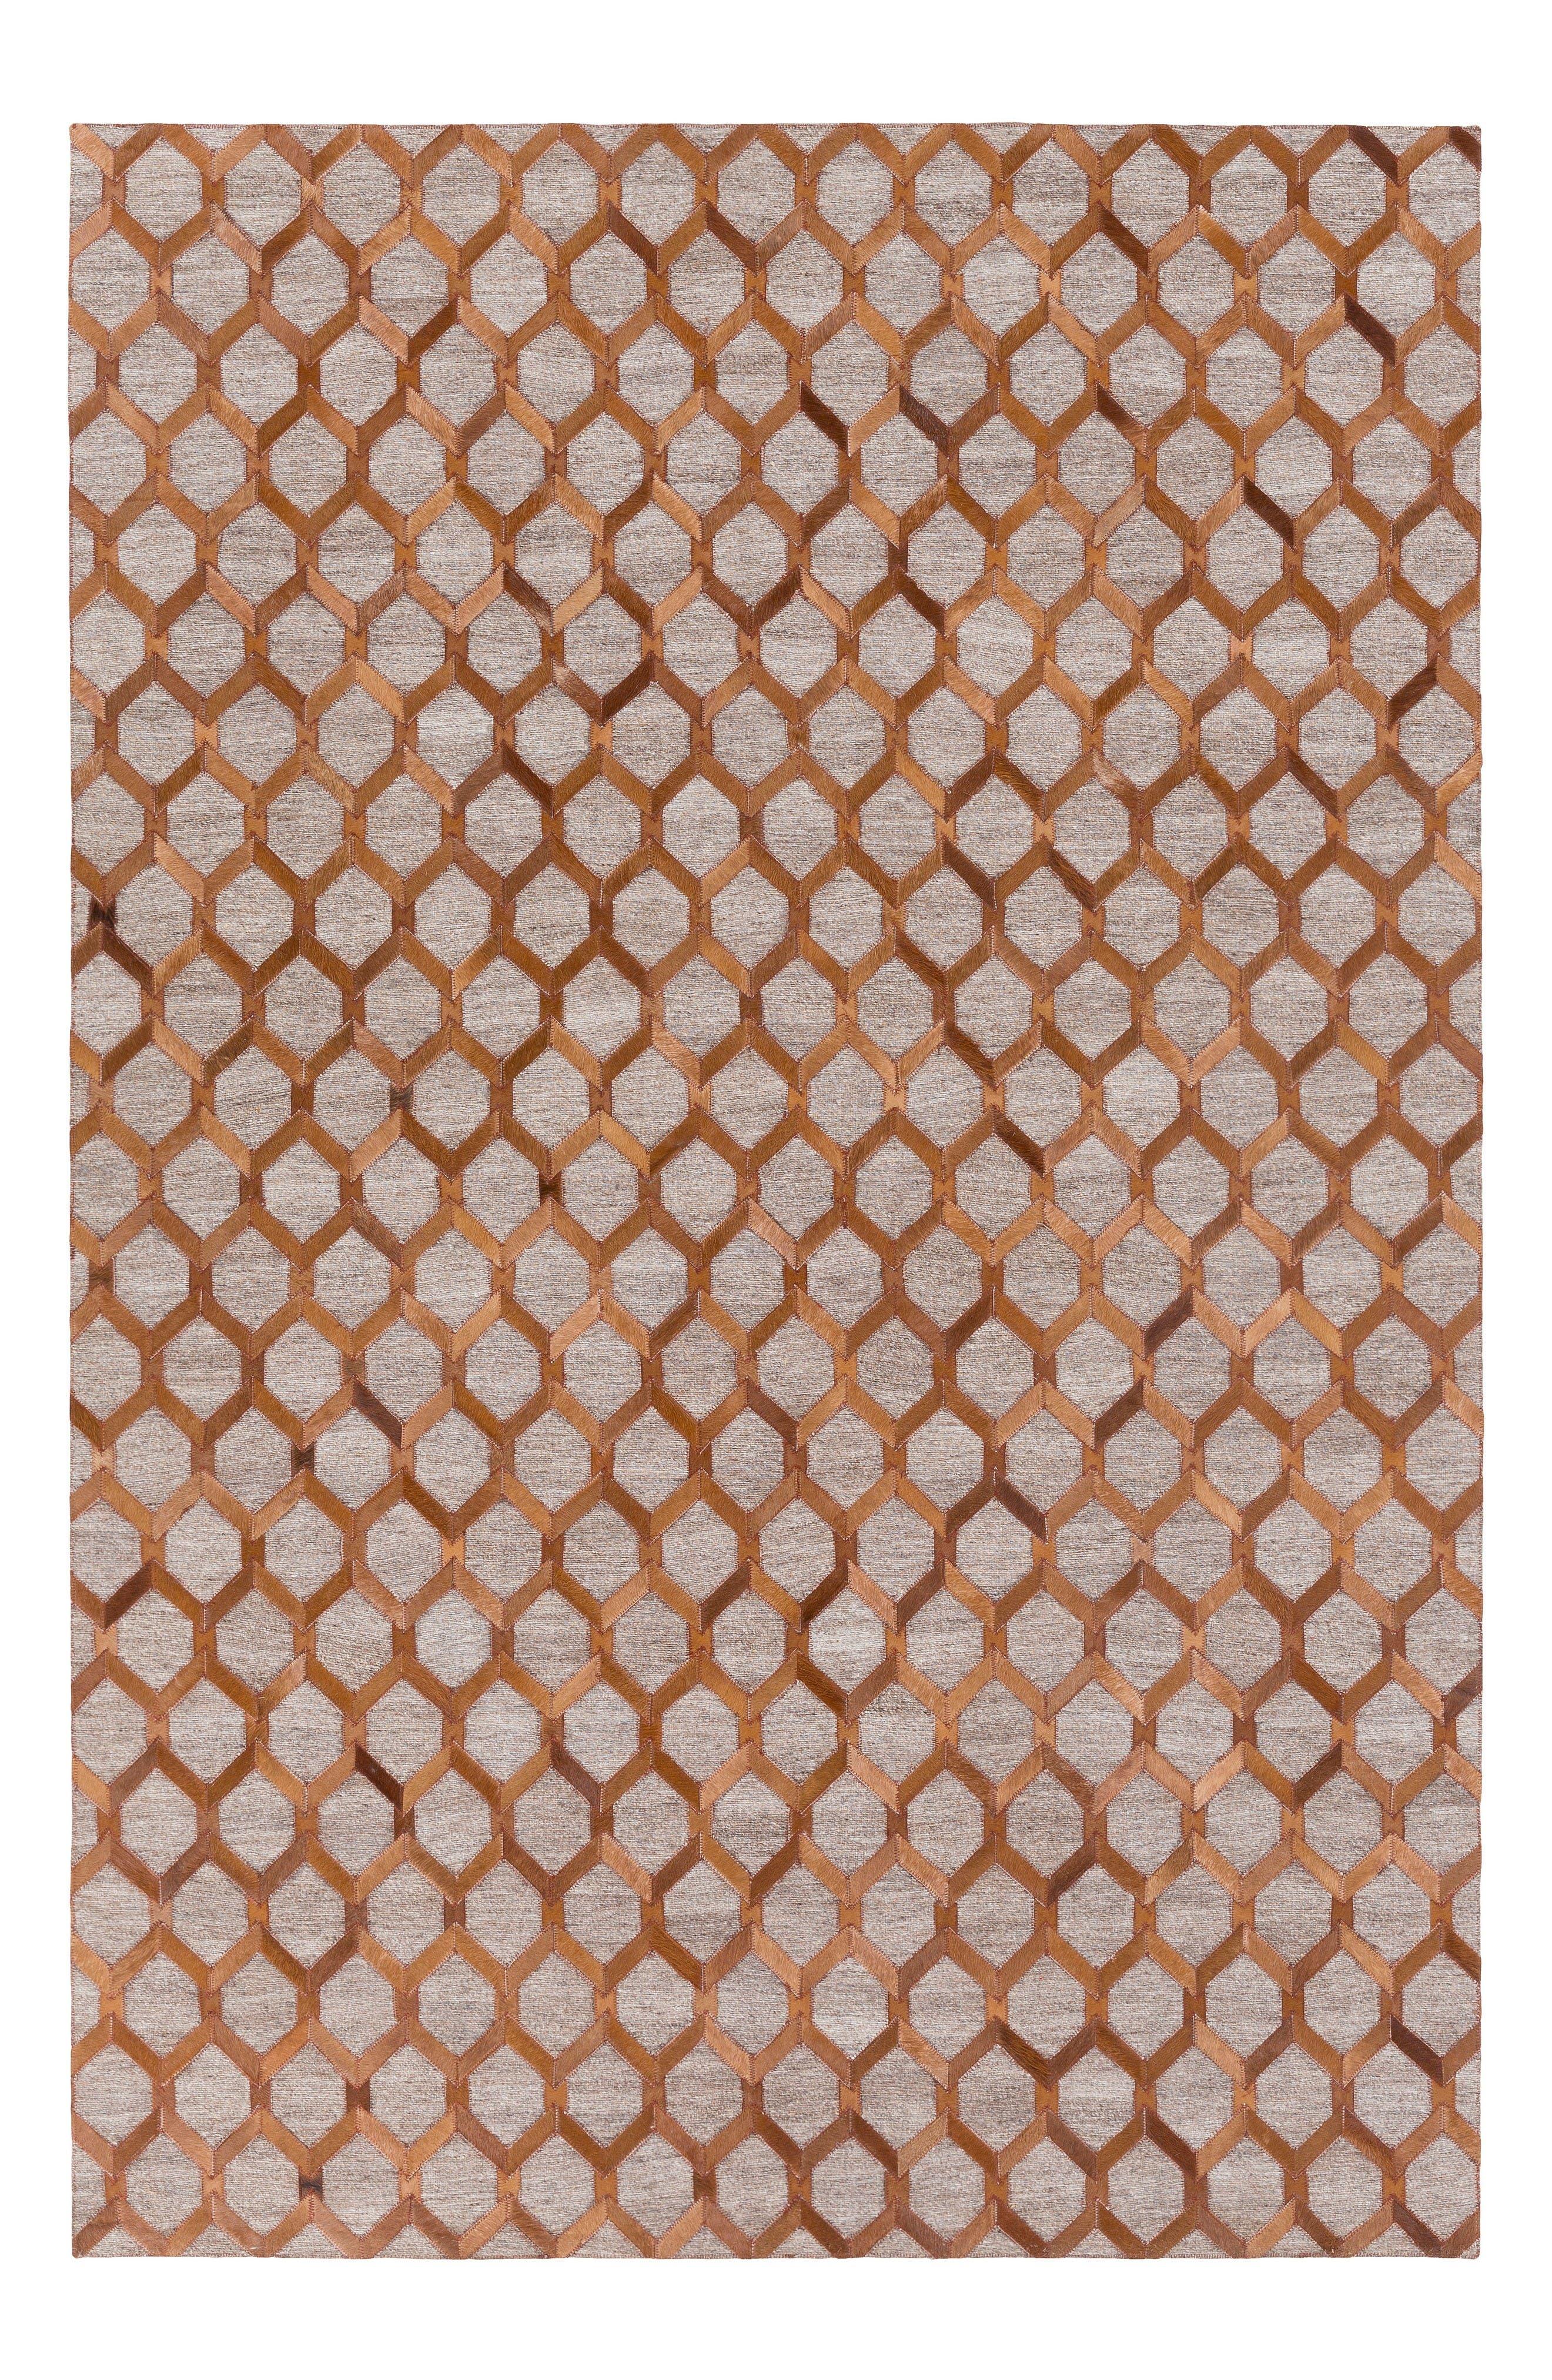 Medora Diamond Genuine Calf Hair Rug,                         Main,                         color, Brown